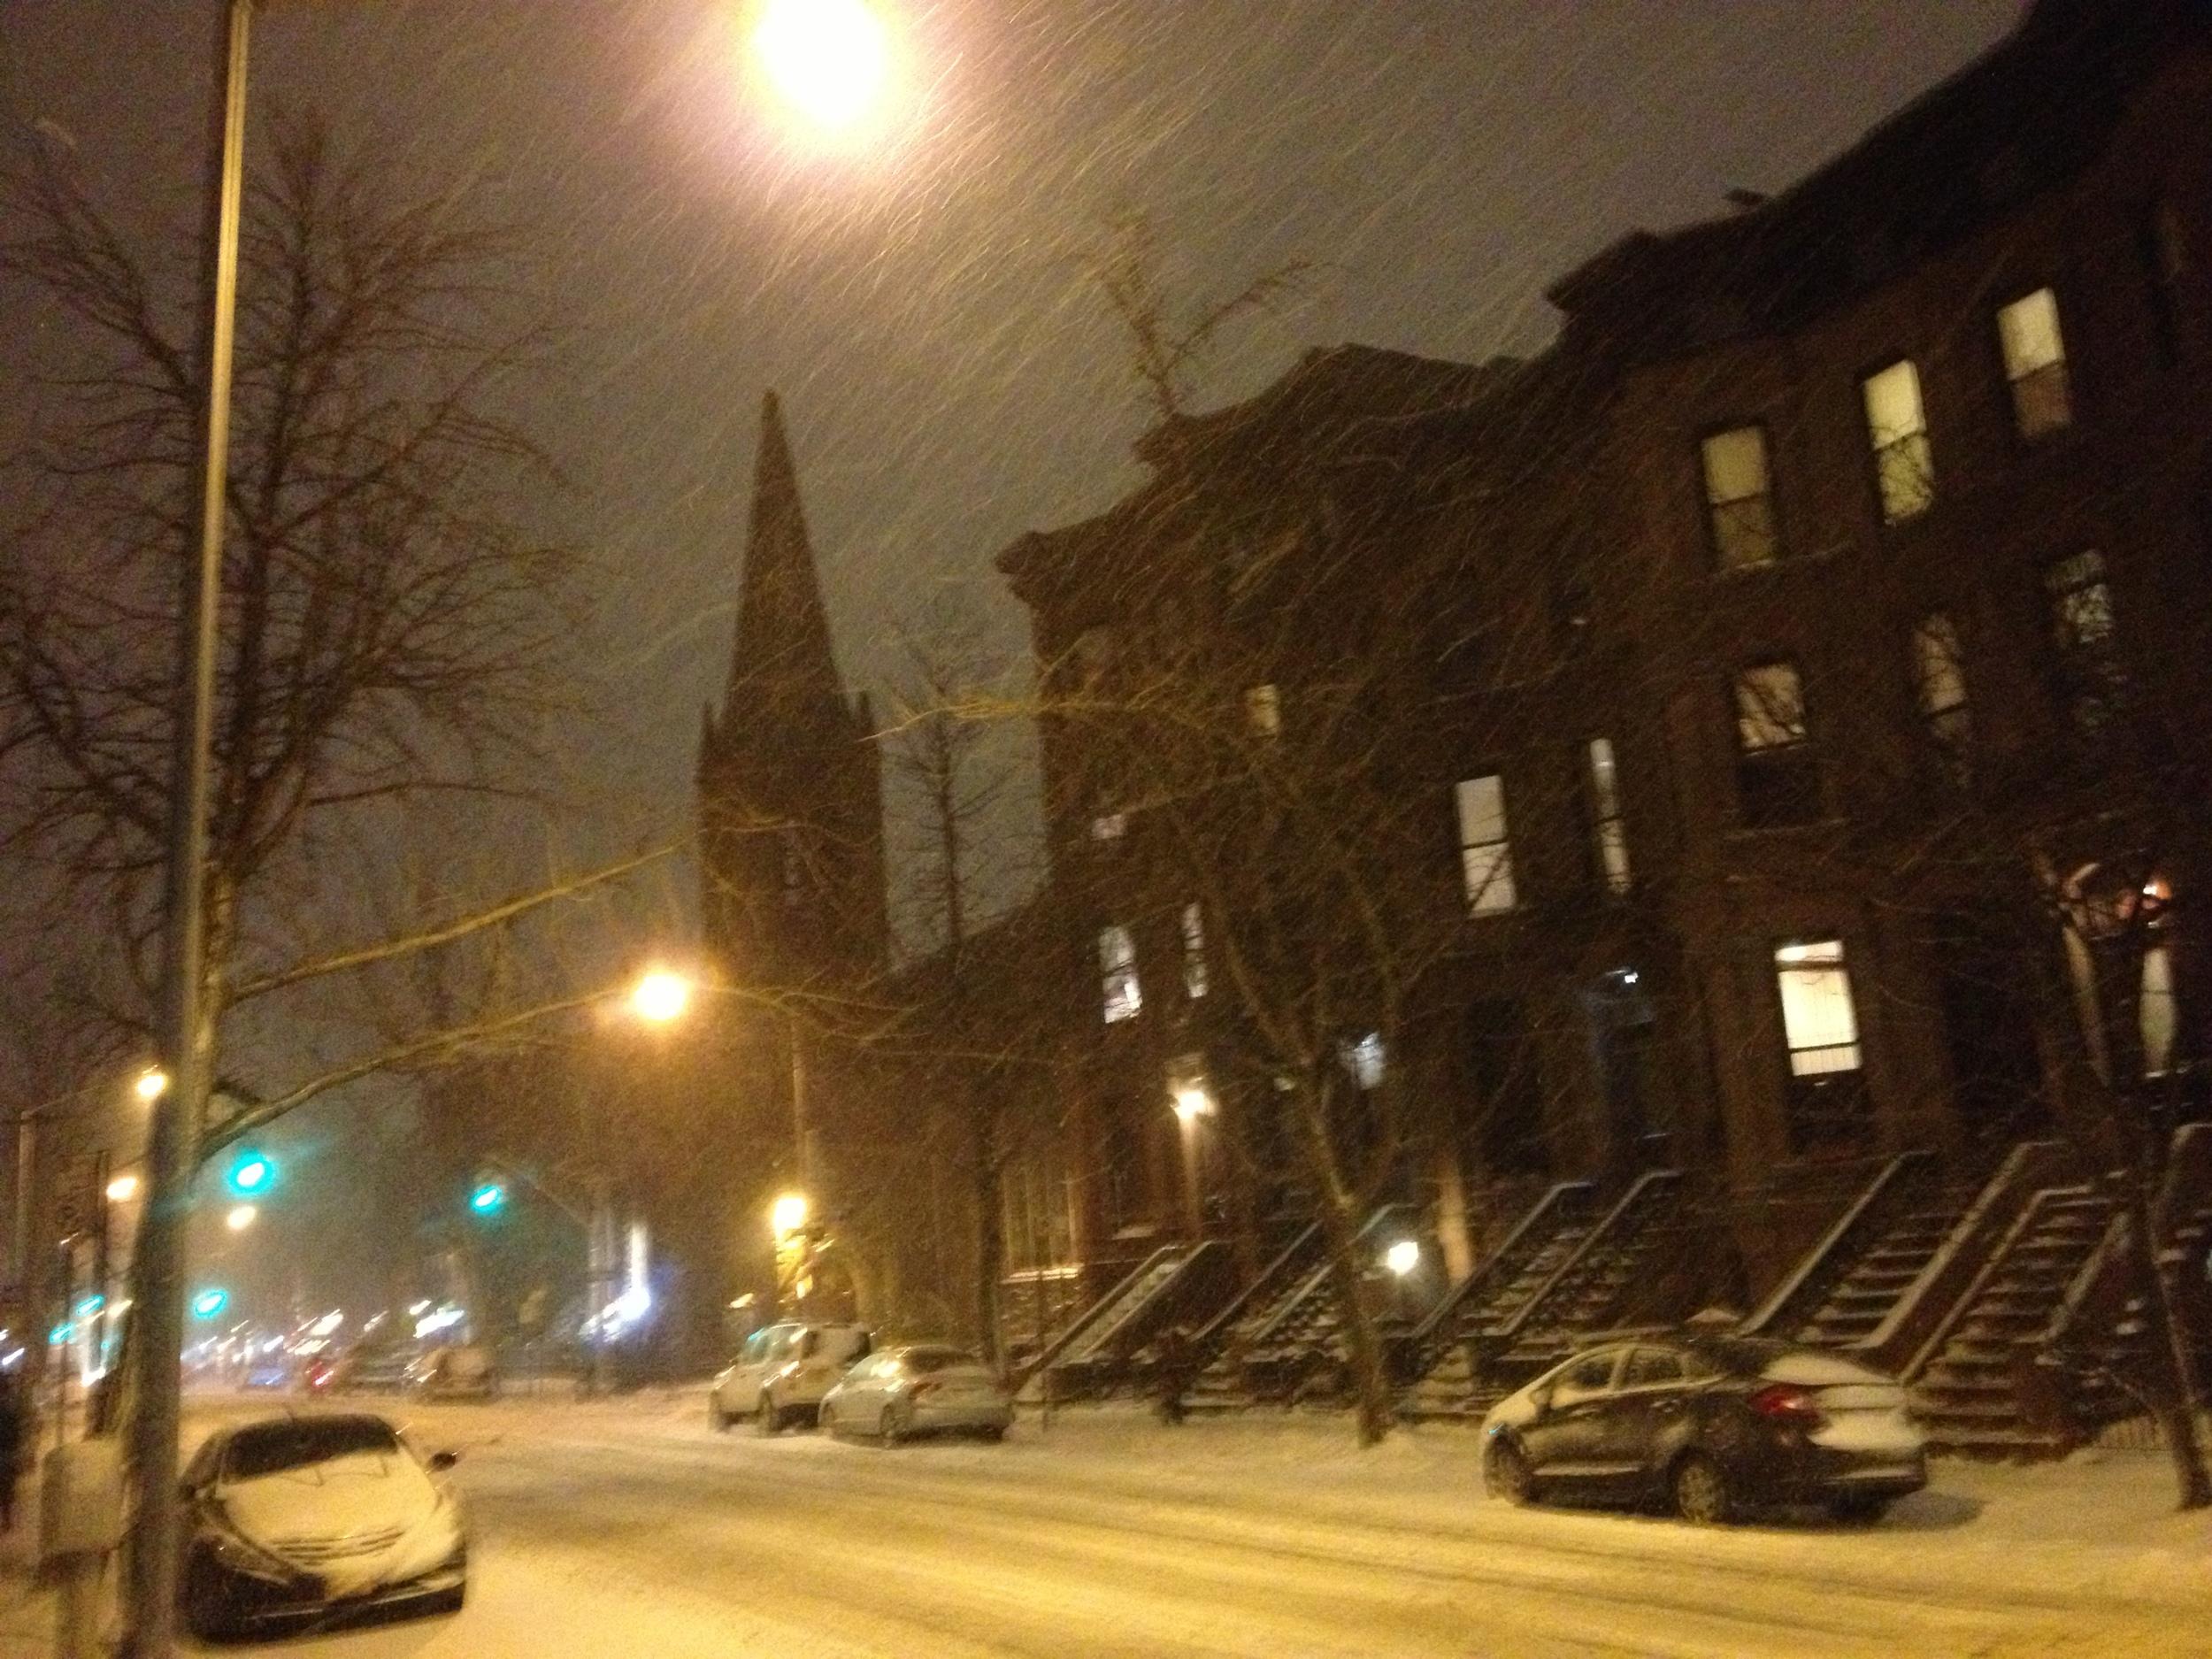 Ahhh, home. Good ol' Park Slope.